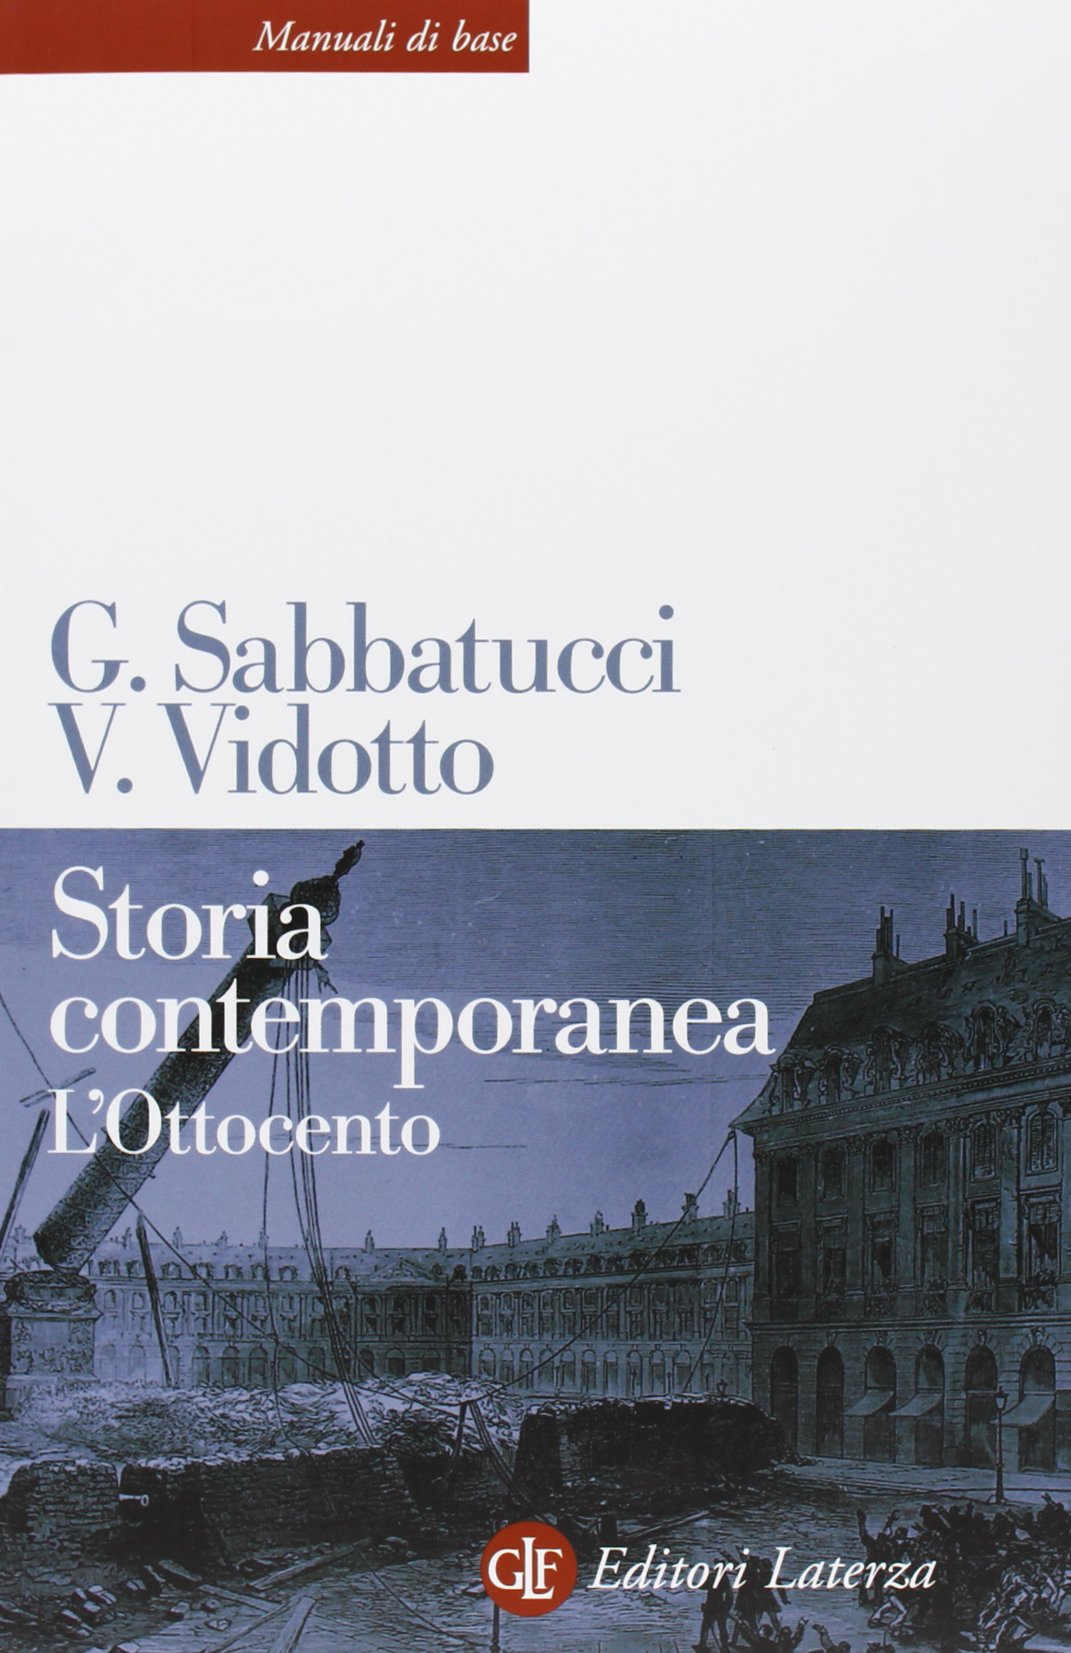 sabatucci vidotto storia contemporanea  Storia contemporanea. L'Ottocento: : Giovanni Sabbatucci ...